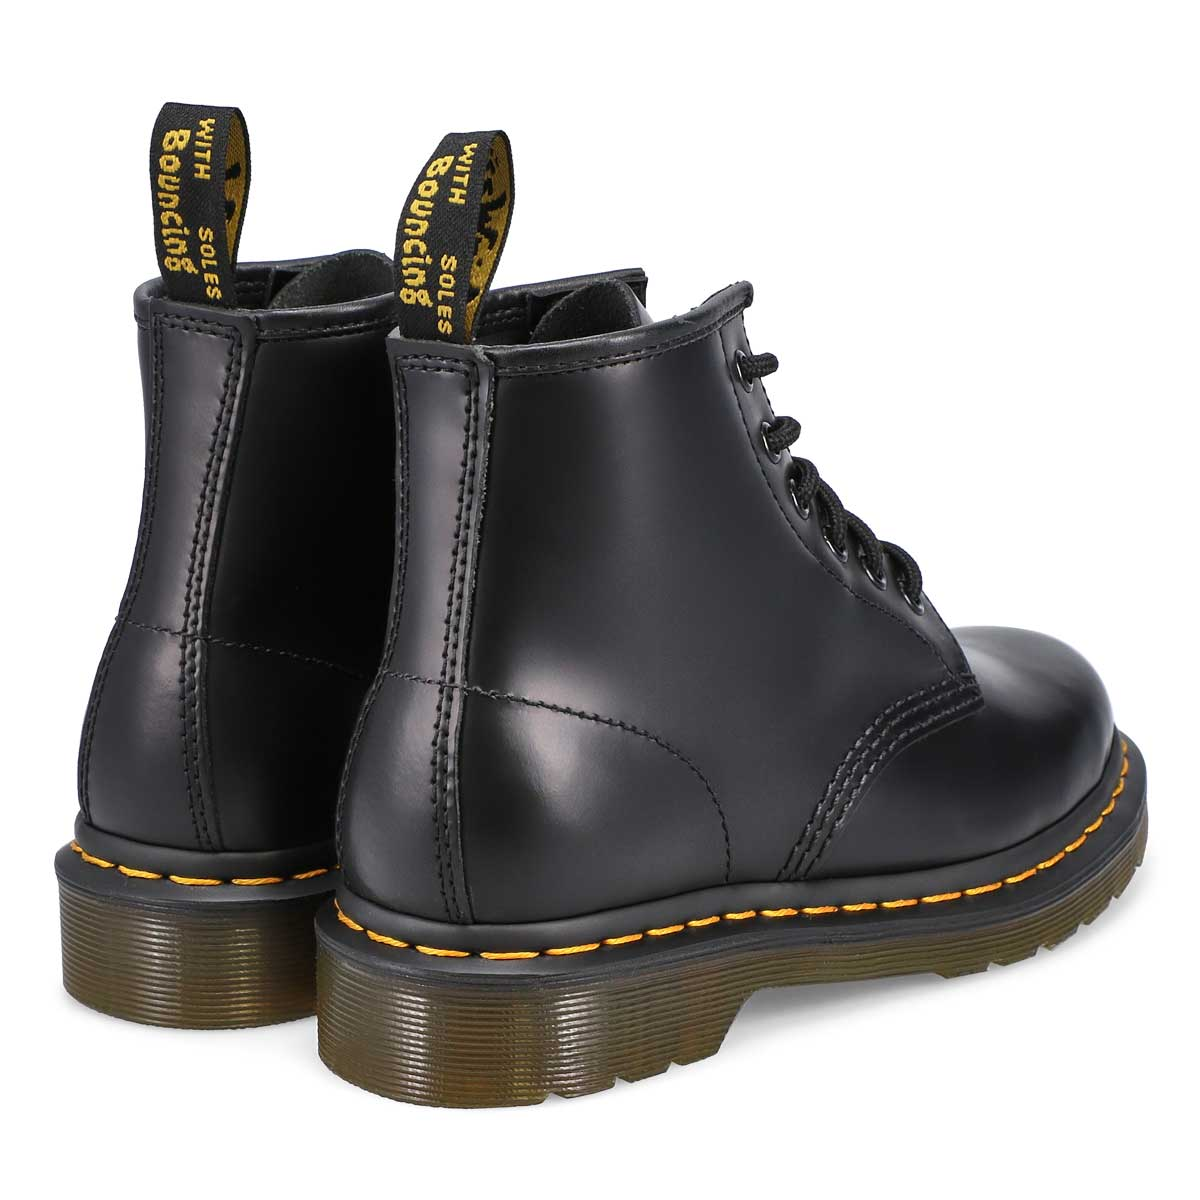 Women's 101 Yellow Stitch Boot - Black